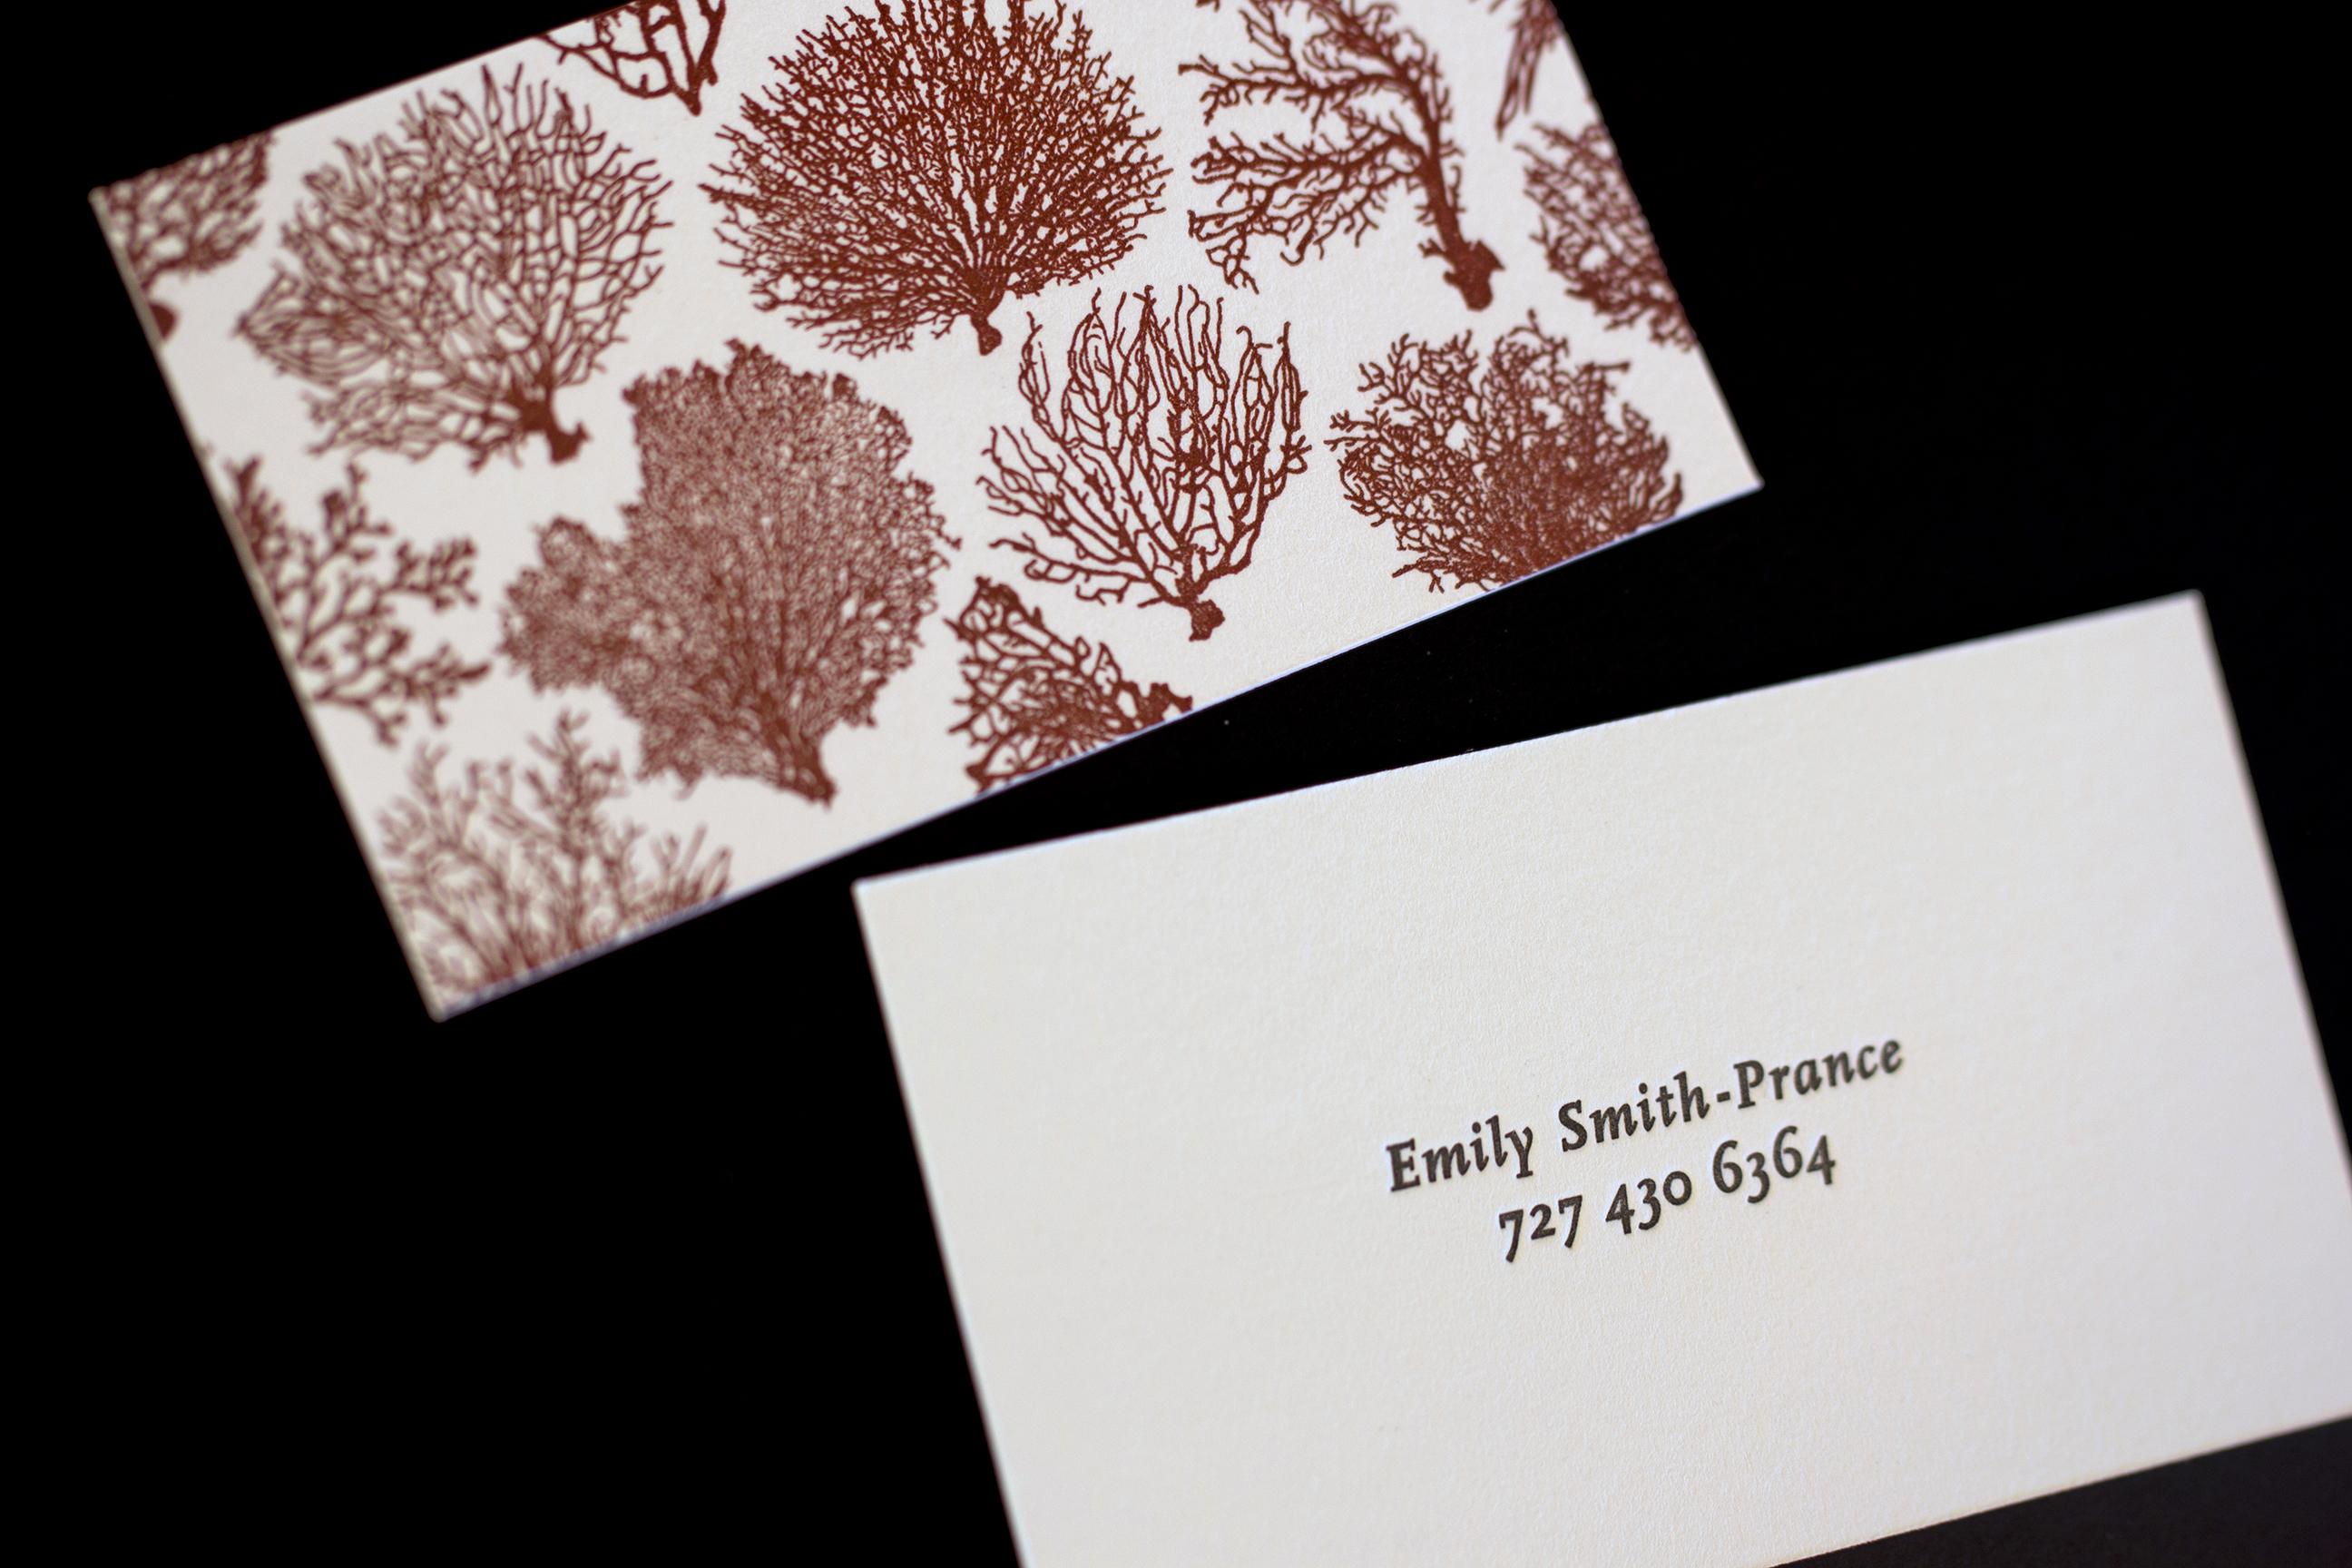 emily_smith-prance_2